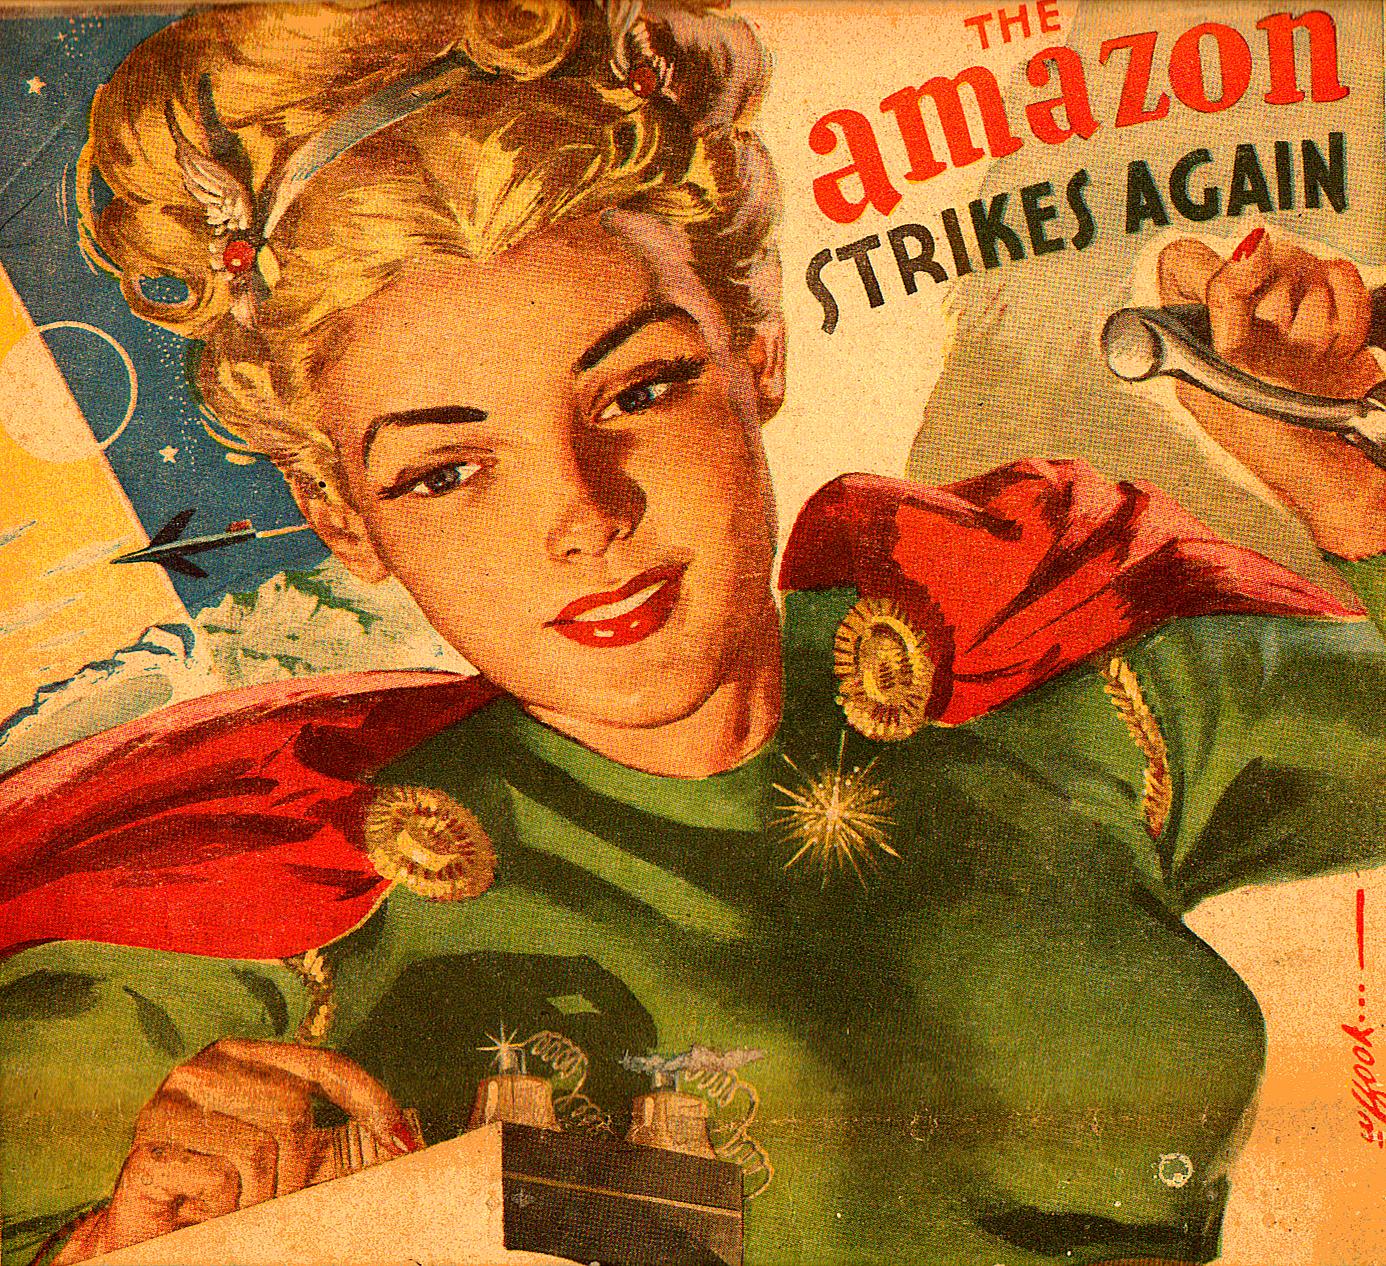 RG Cameron March 7 2014 illo #2 'Amazon Strikes Again'